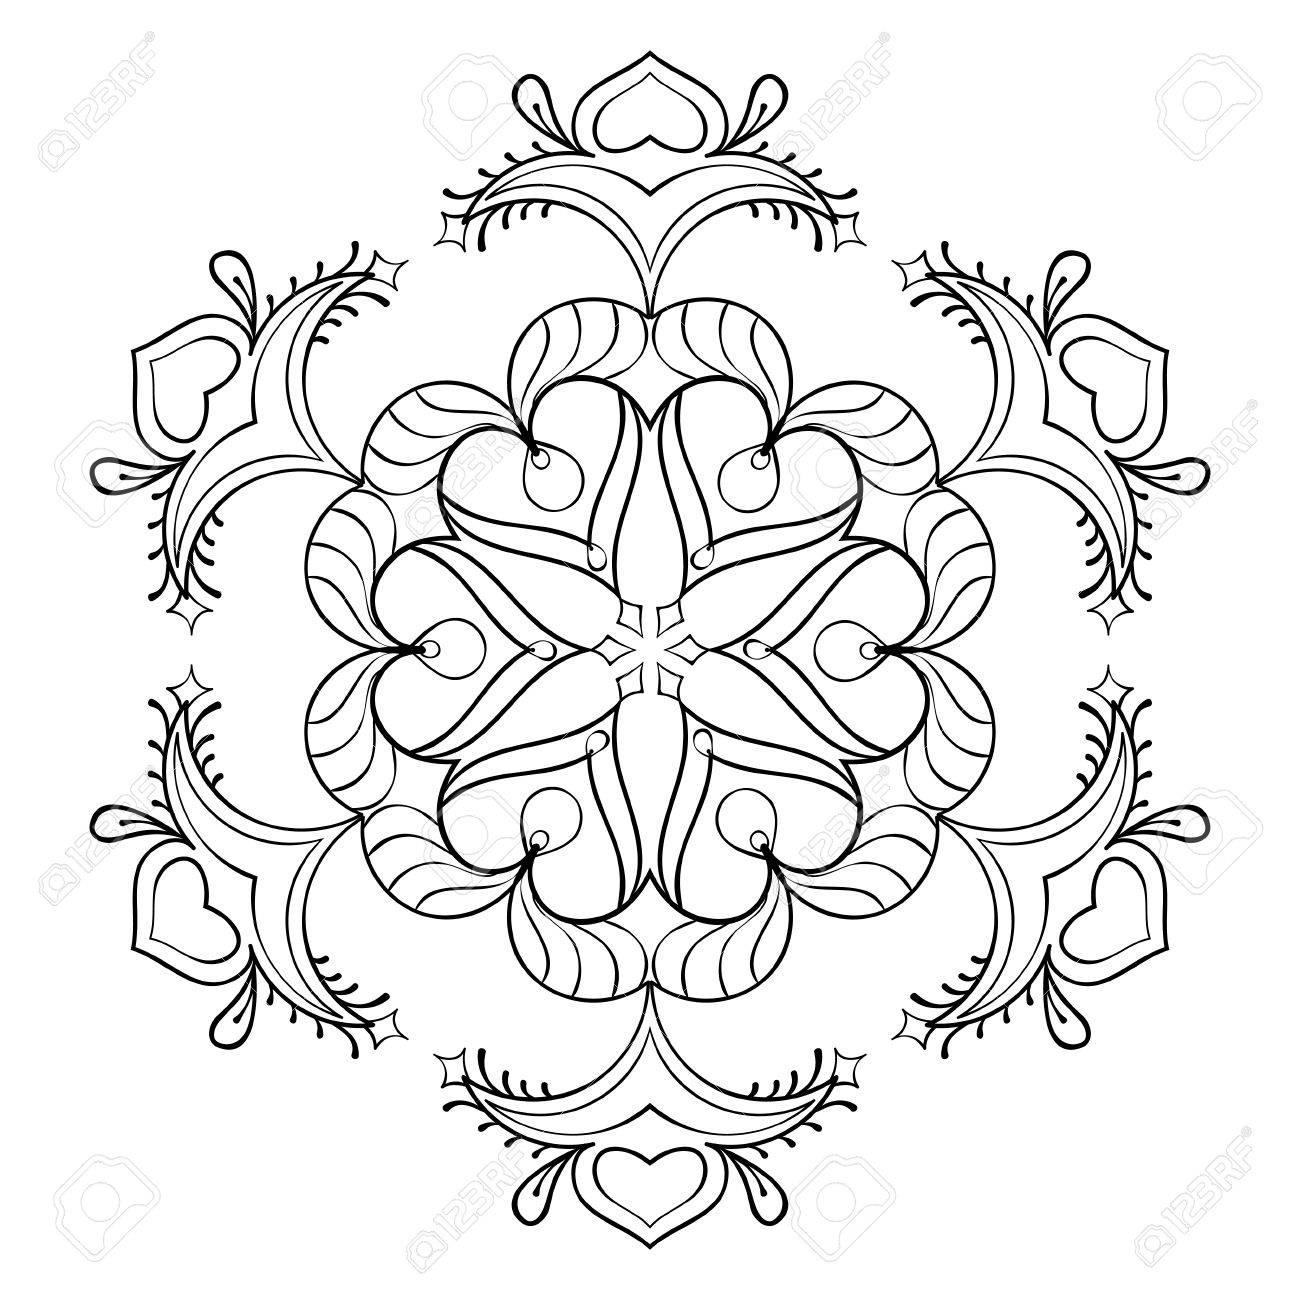 Vector Zentangle Snow Flake, Elegant Mandala For Adult Coloring ...